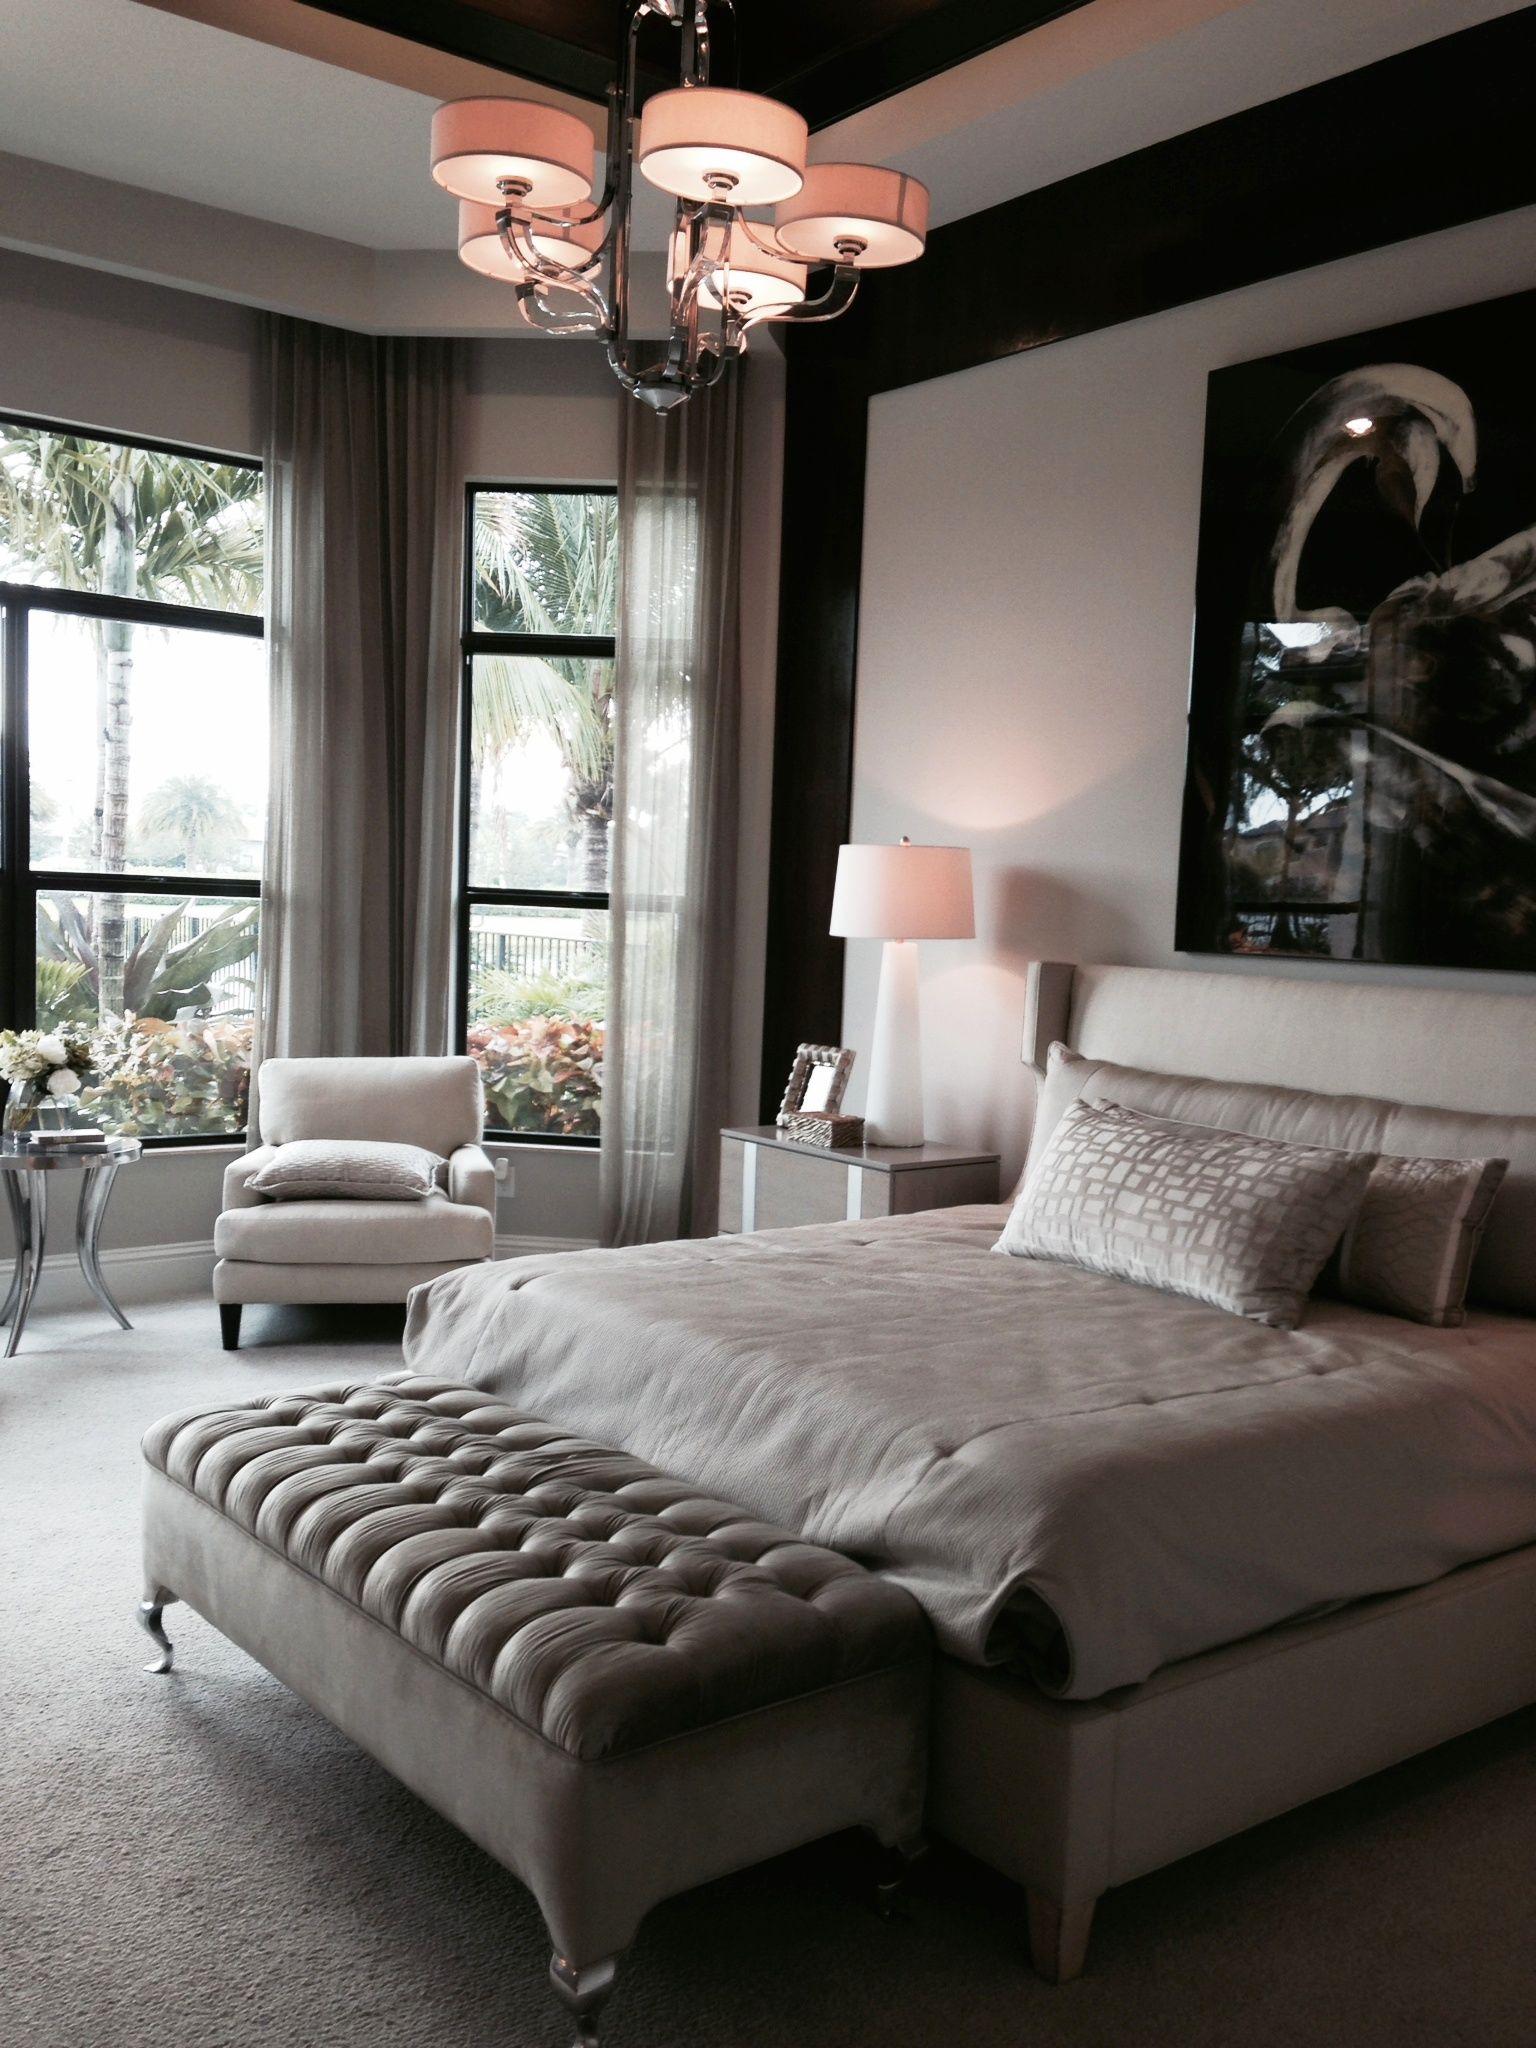 Model home bedroom | Inside a Home in 2019 | Bedroom decor ... on Model Bedroom Interior Design  id=24661